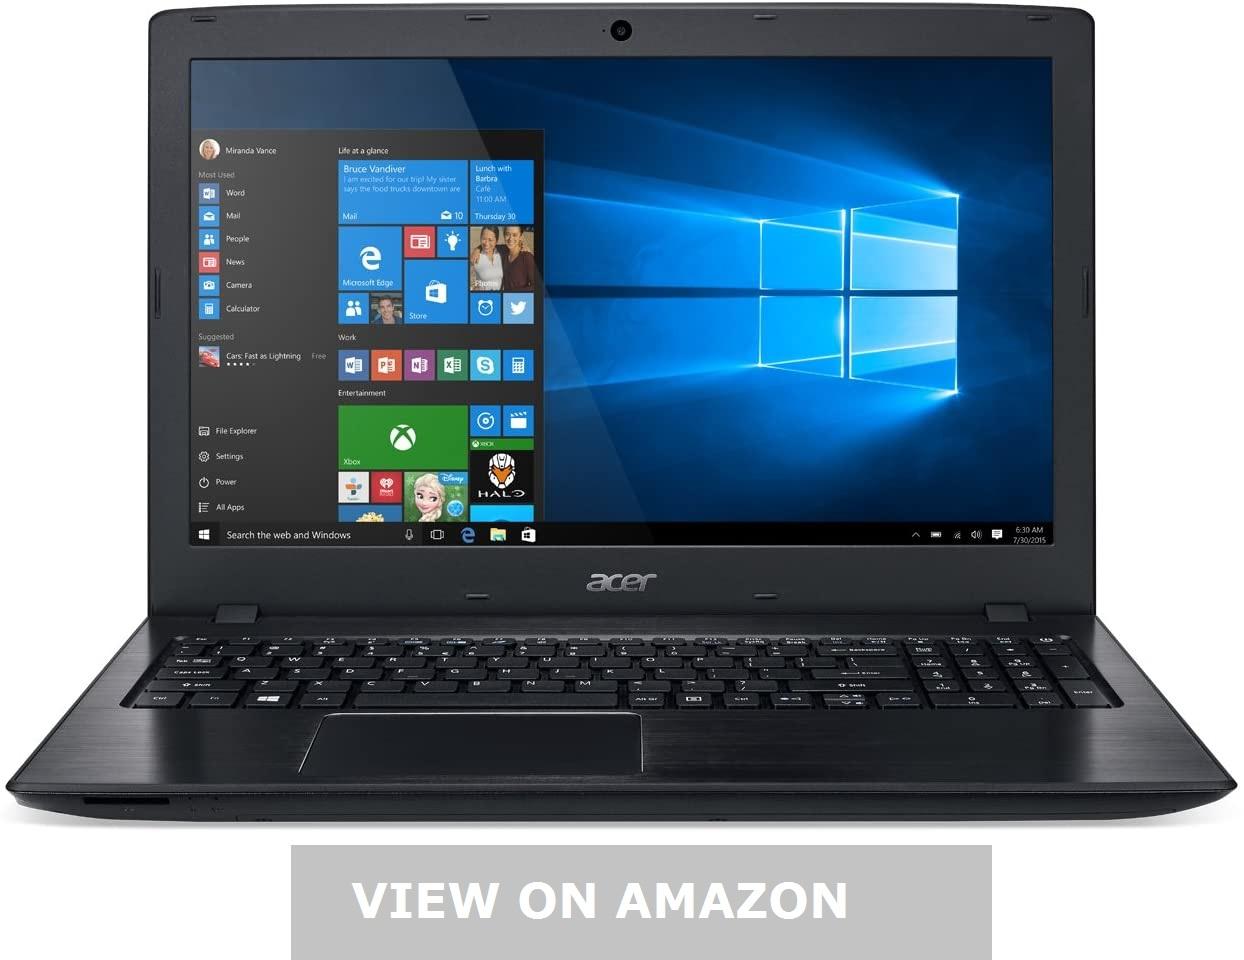 8 Best Laptops For Ubuntu: Buyer's Guide (2021)